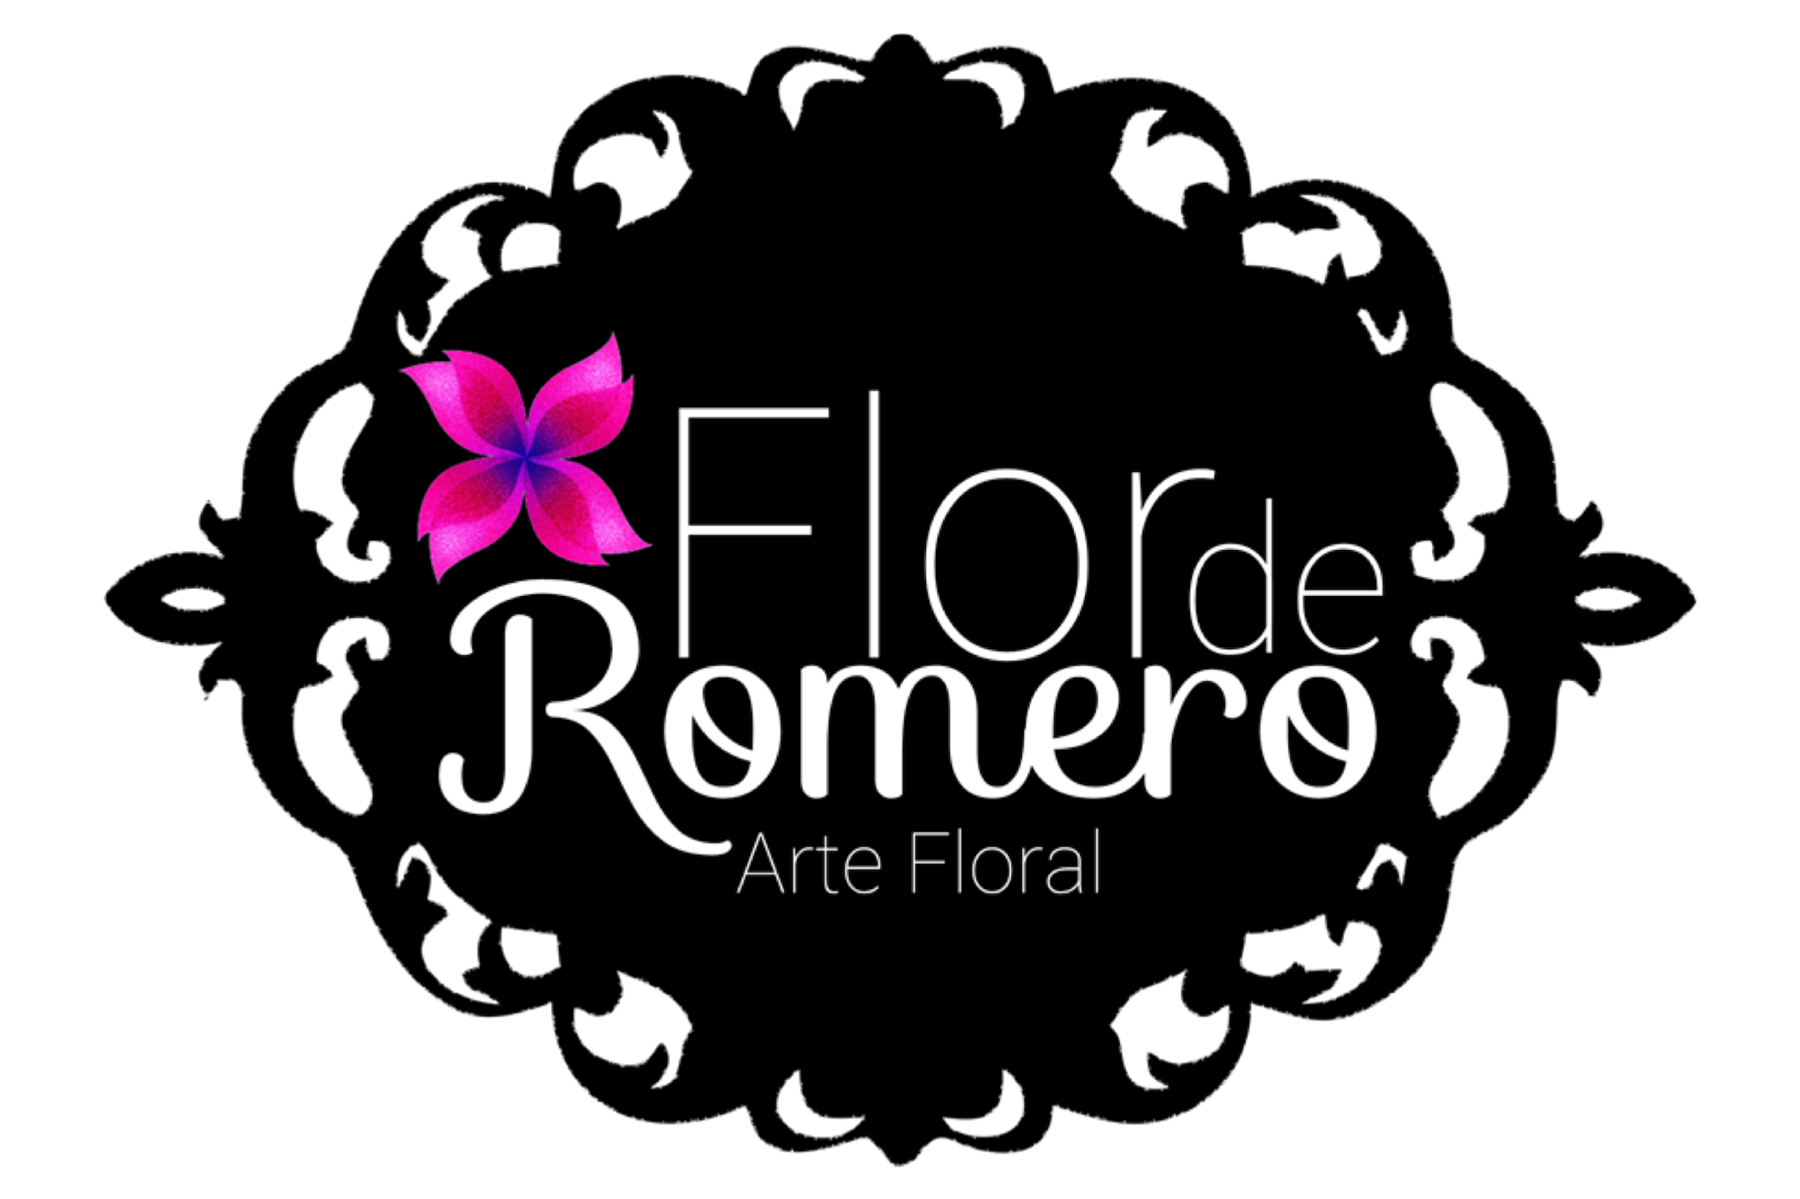 Flor de Romero